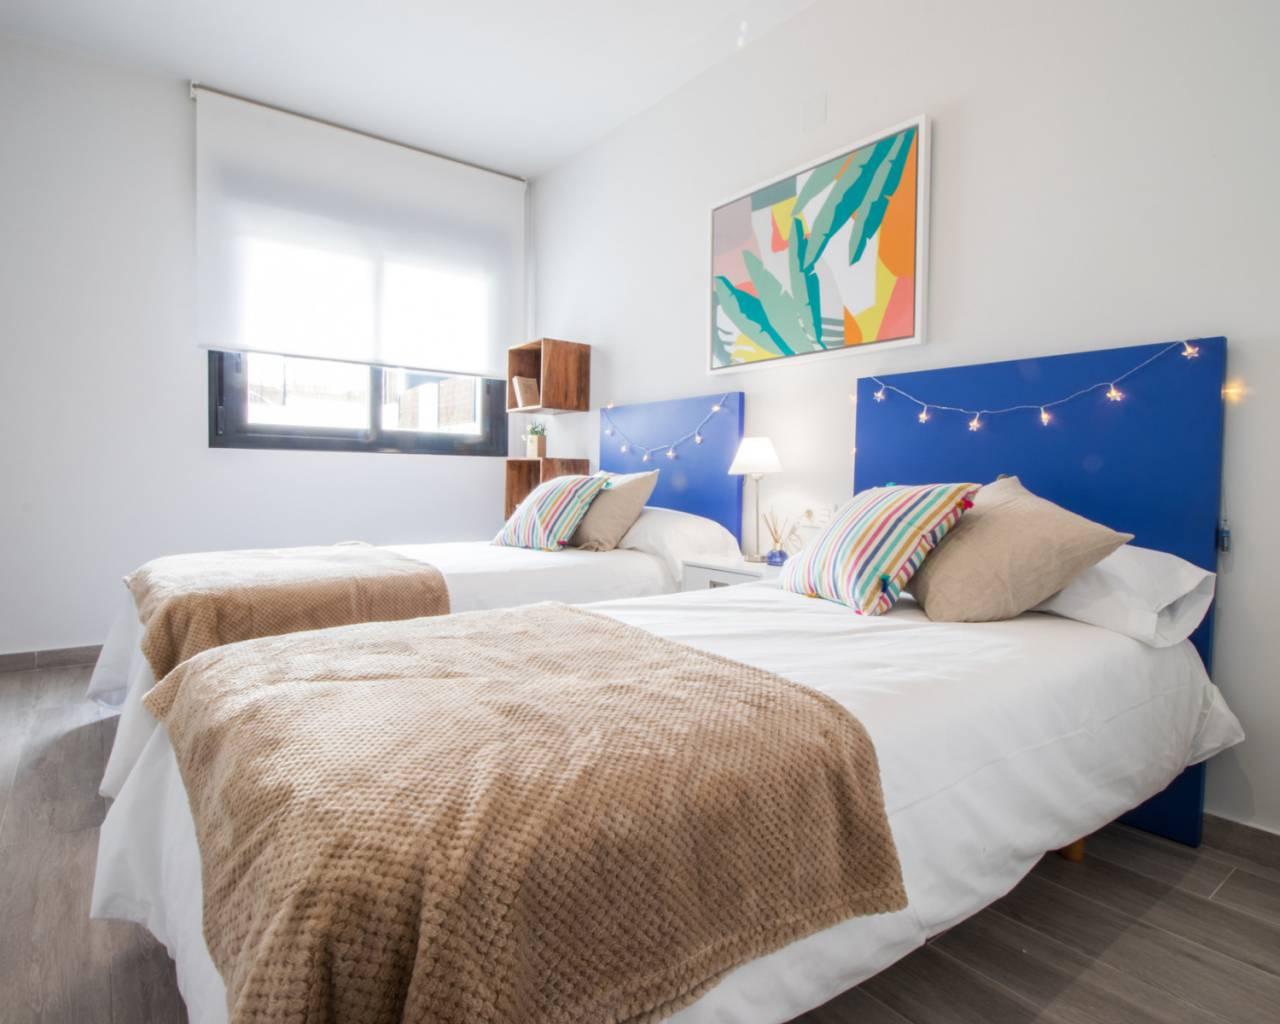 nieuwbouw-appartement-san-miguel-de-salinas_1792_xl